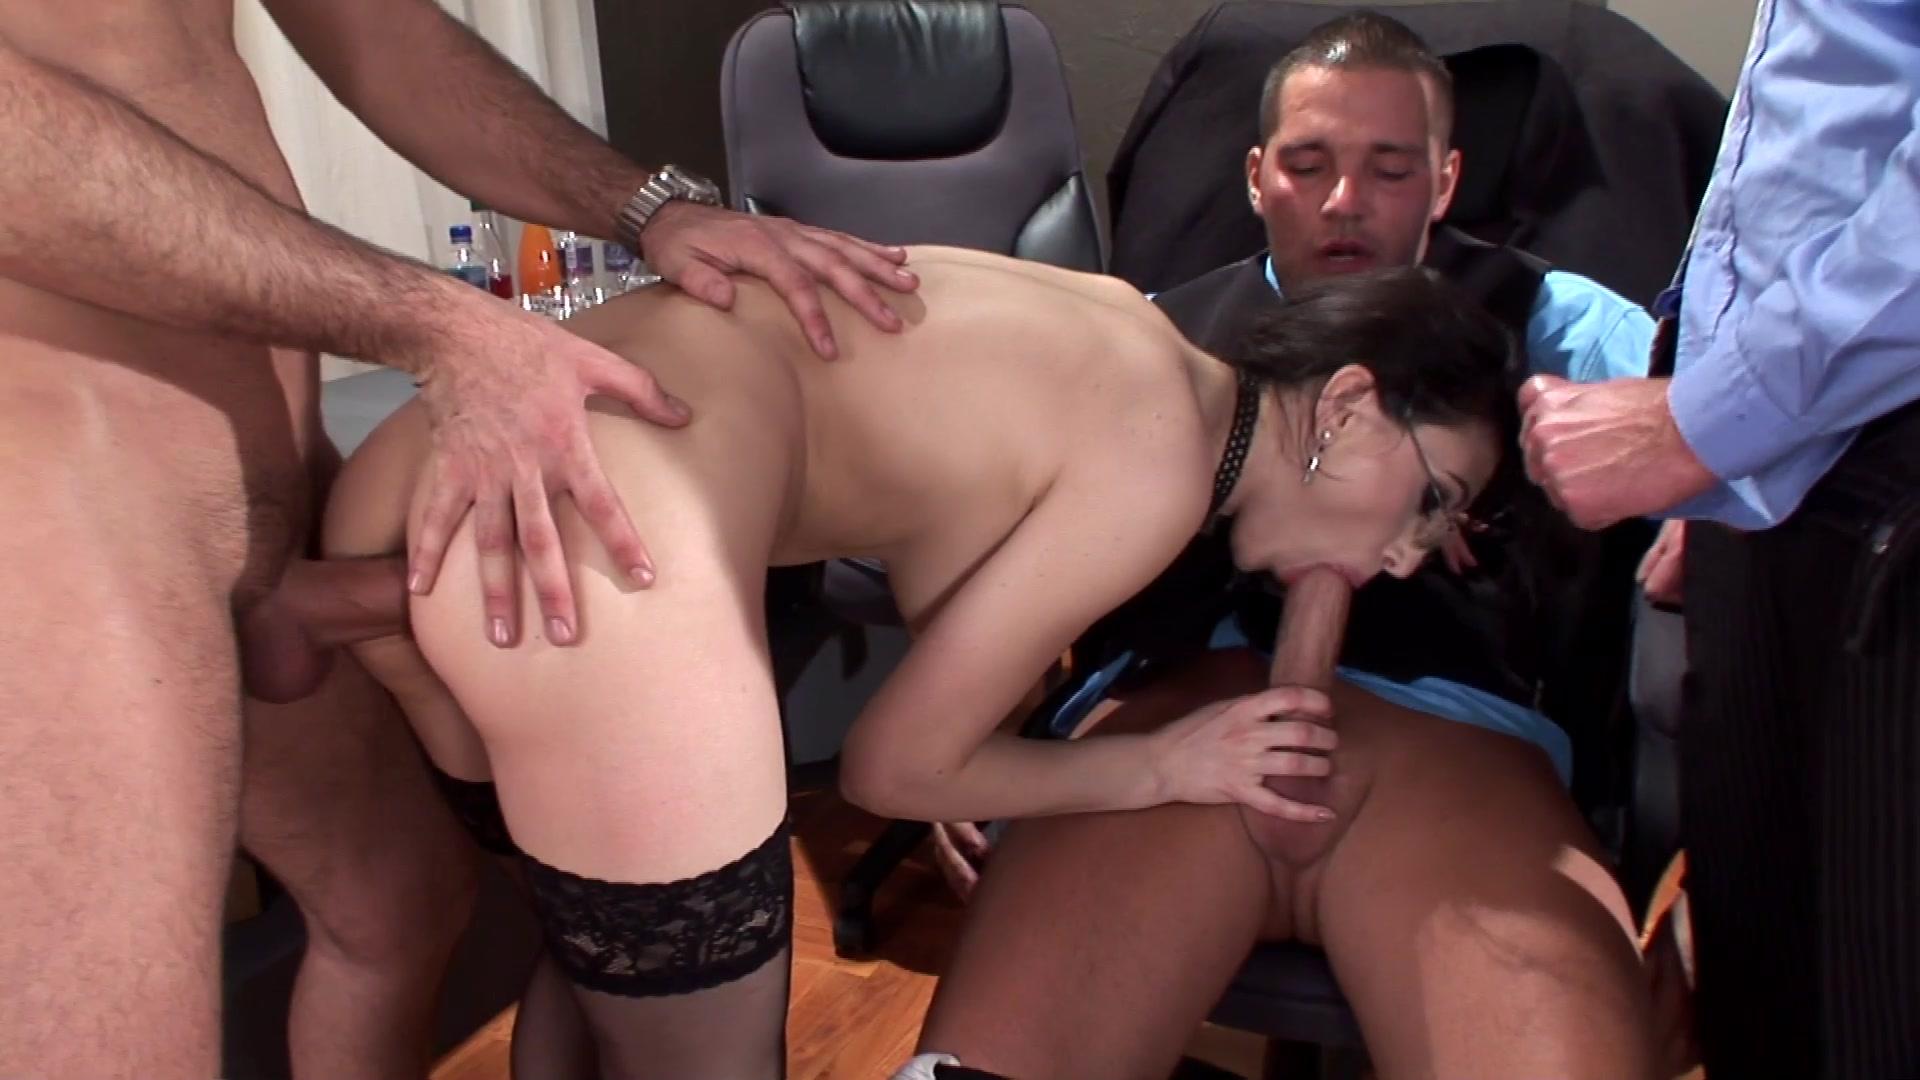 Iui and orgasm